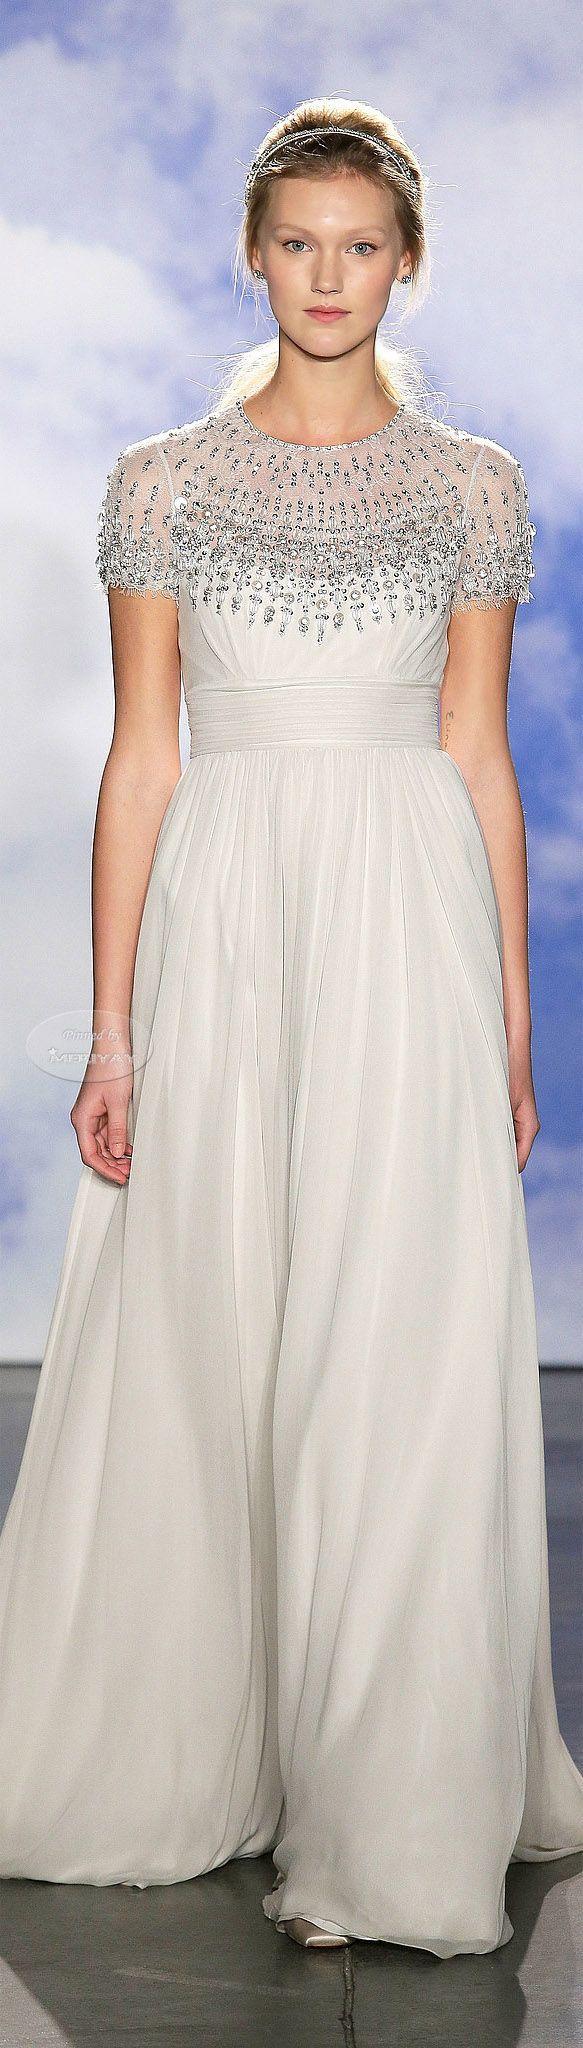 Jenny Packham Bridal Spring 2015. jaglady